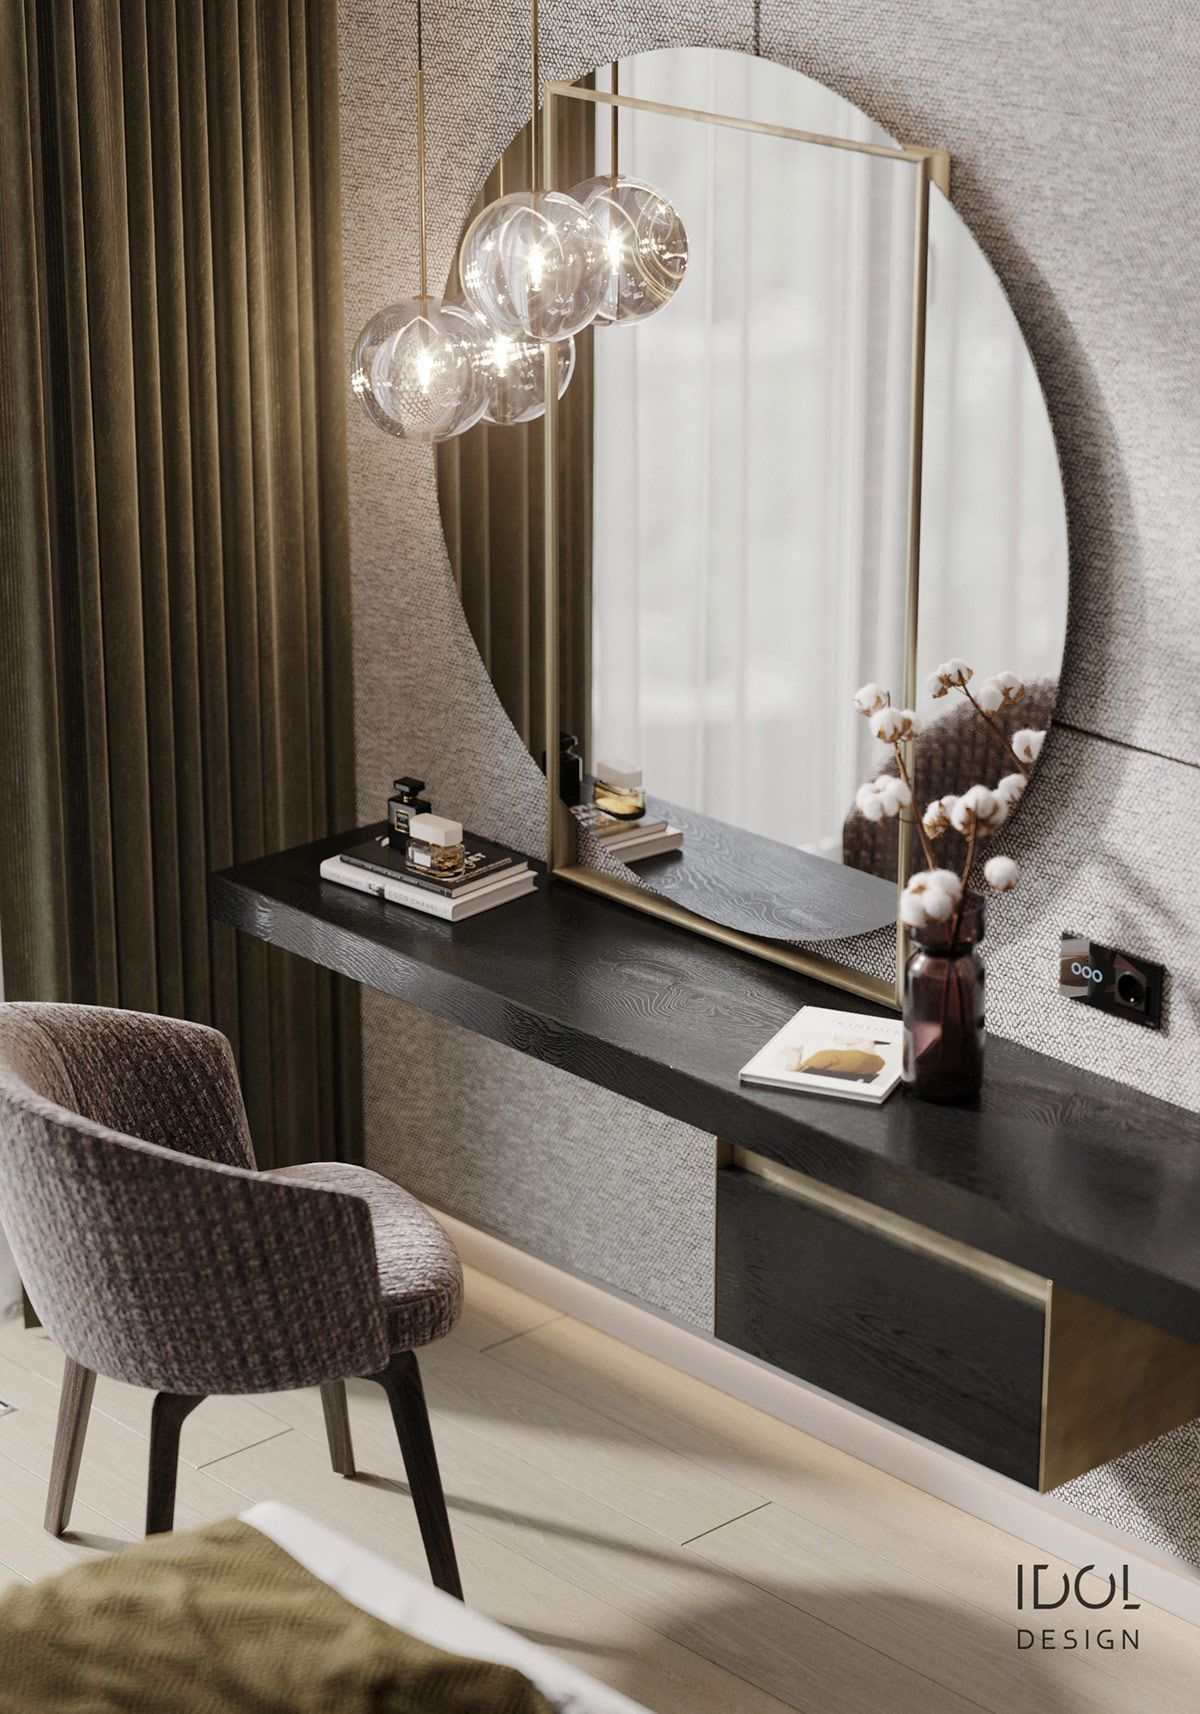 Home Designing Luxury Modern Living In Grey And Gold Contemporary Designers Furniture Da Vinci Lif In 2020 Bedroom Interior Contemporary Furniture Design Interior